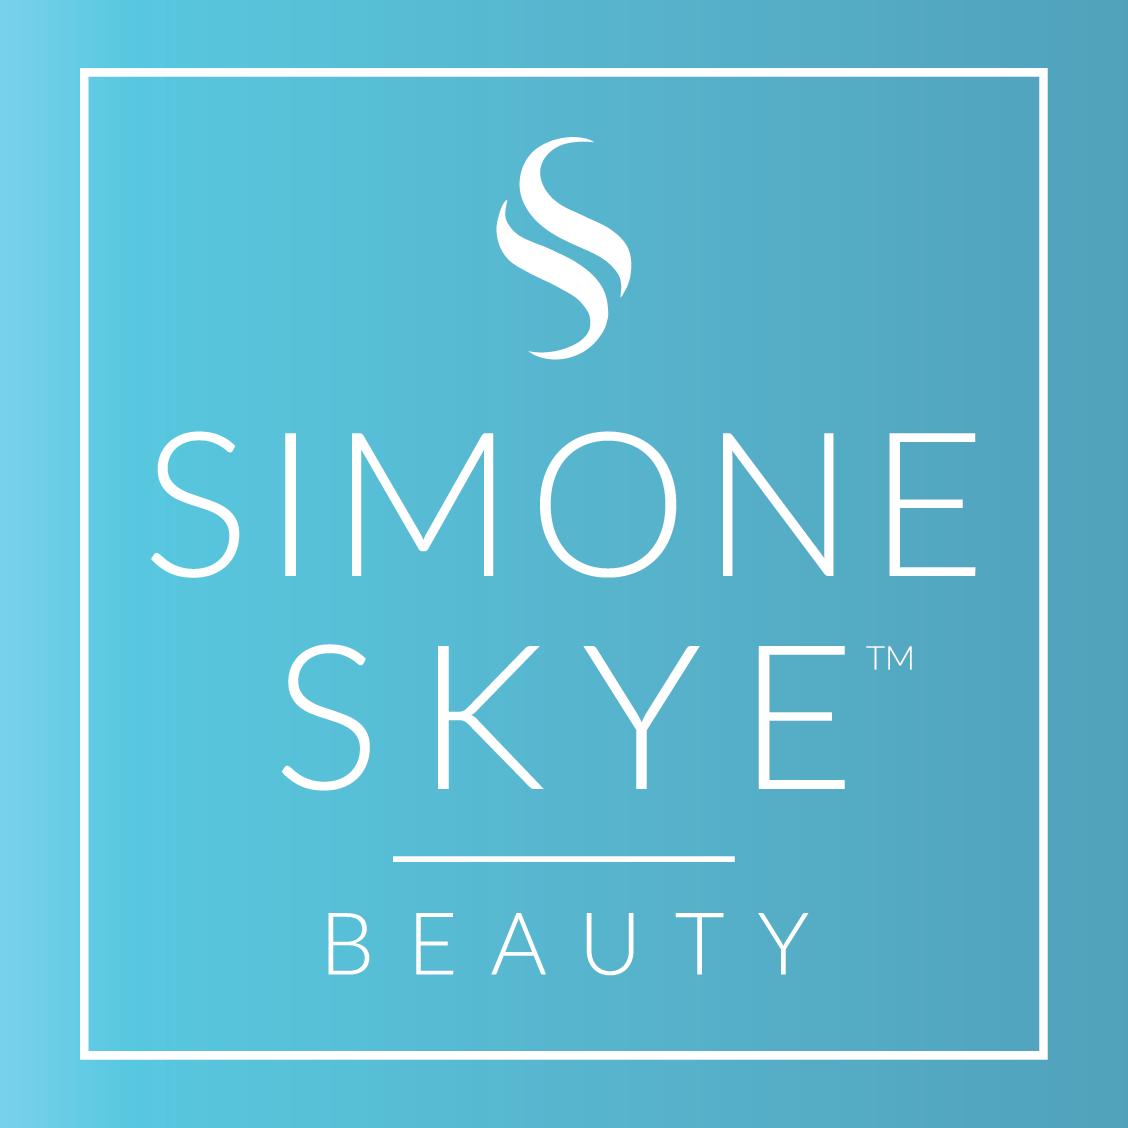 Simone Skye Beauty LLC